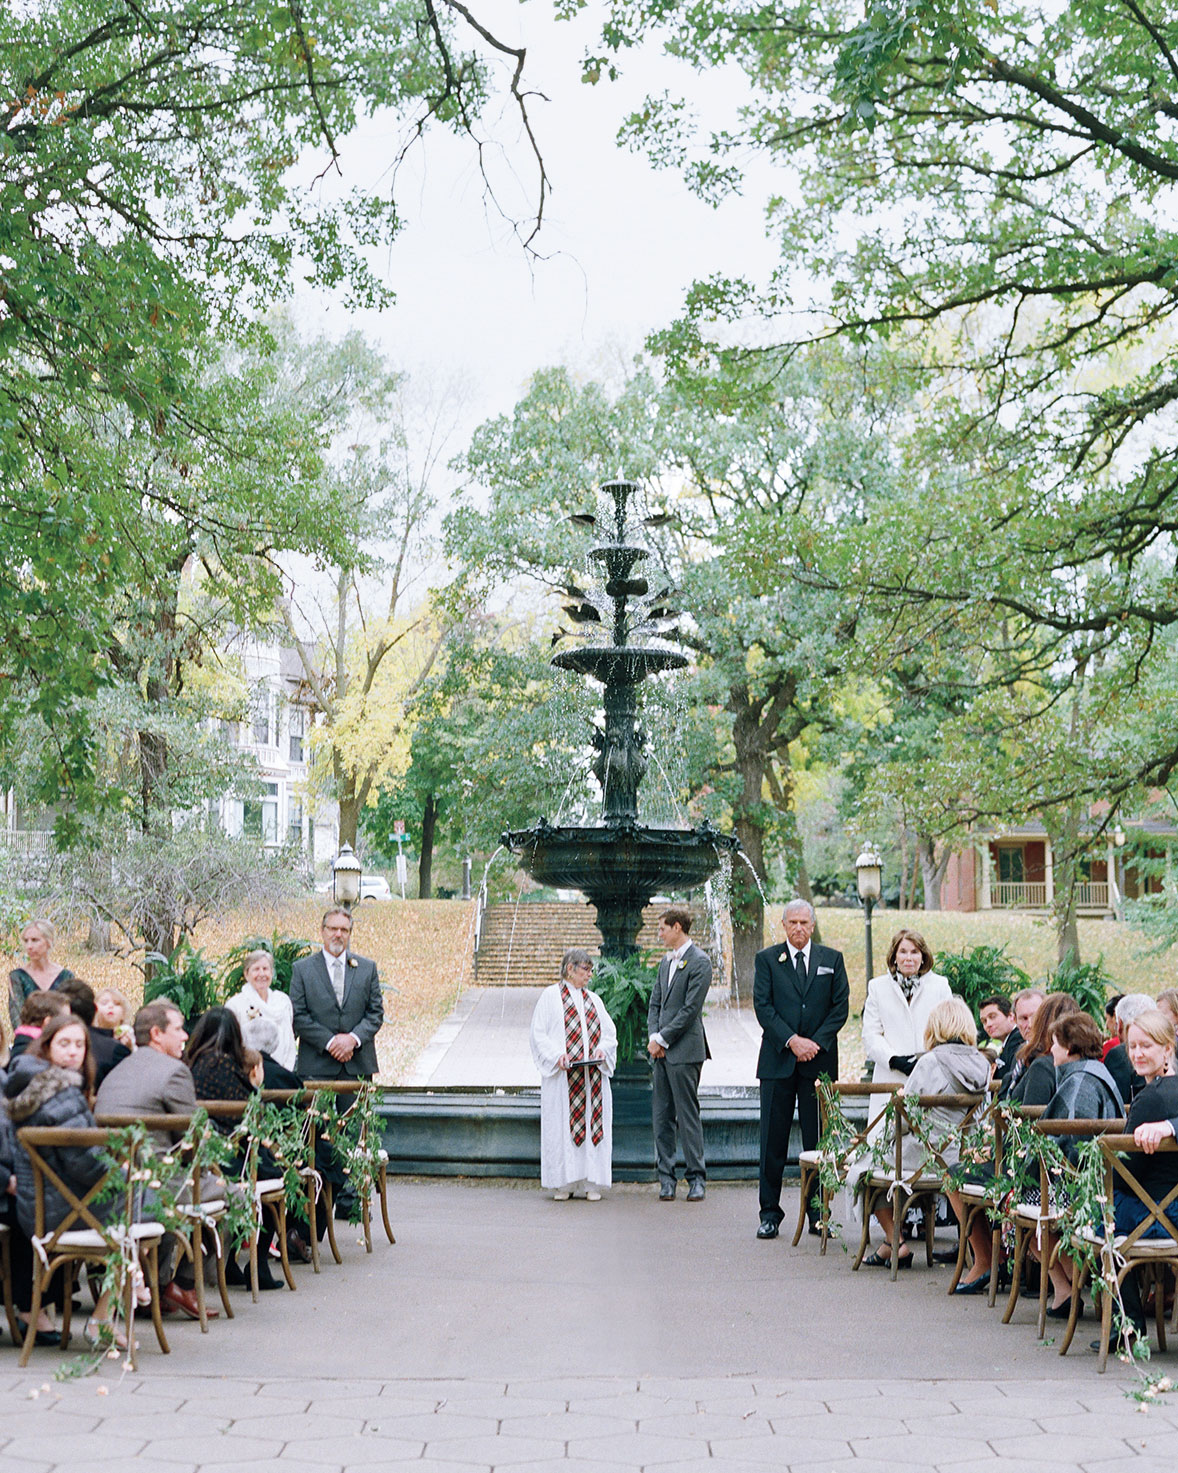 adrienne-jason-wedding-minnesota-ceremony-aisle-0382-s111925.jpg